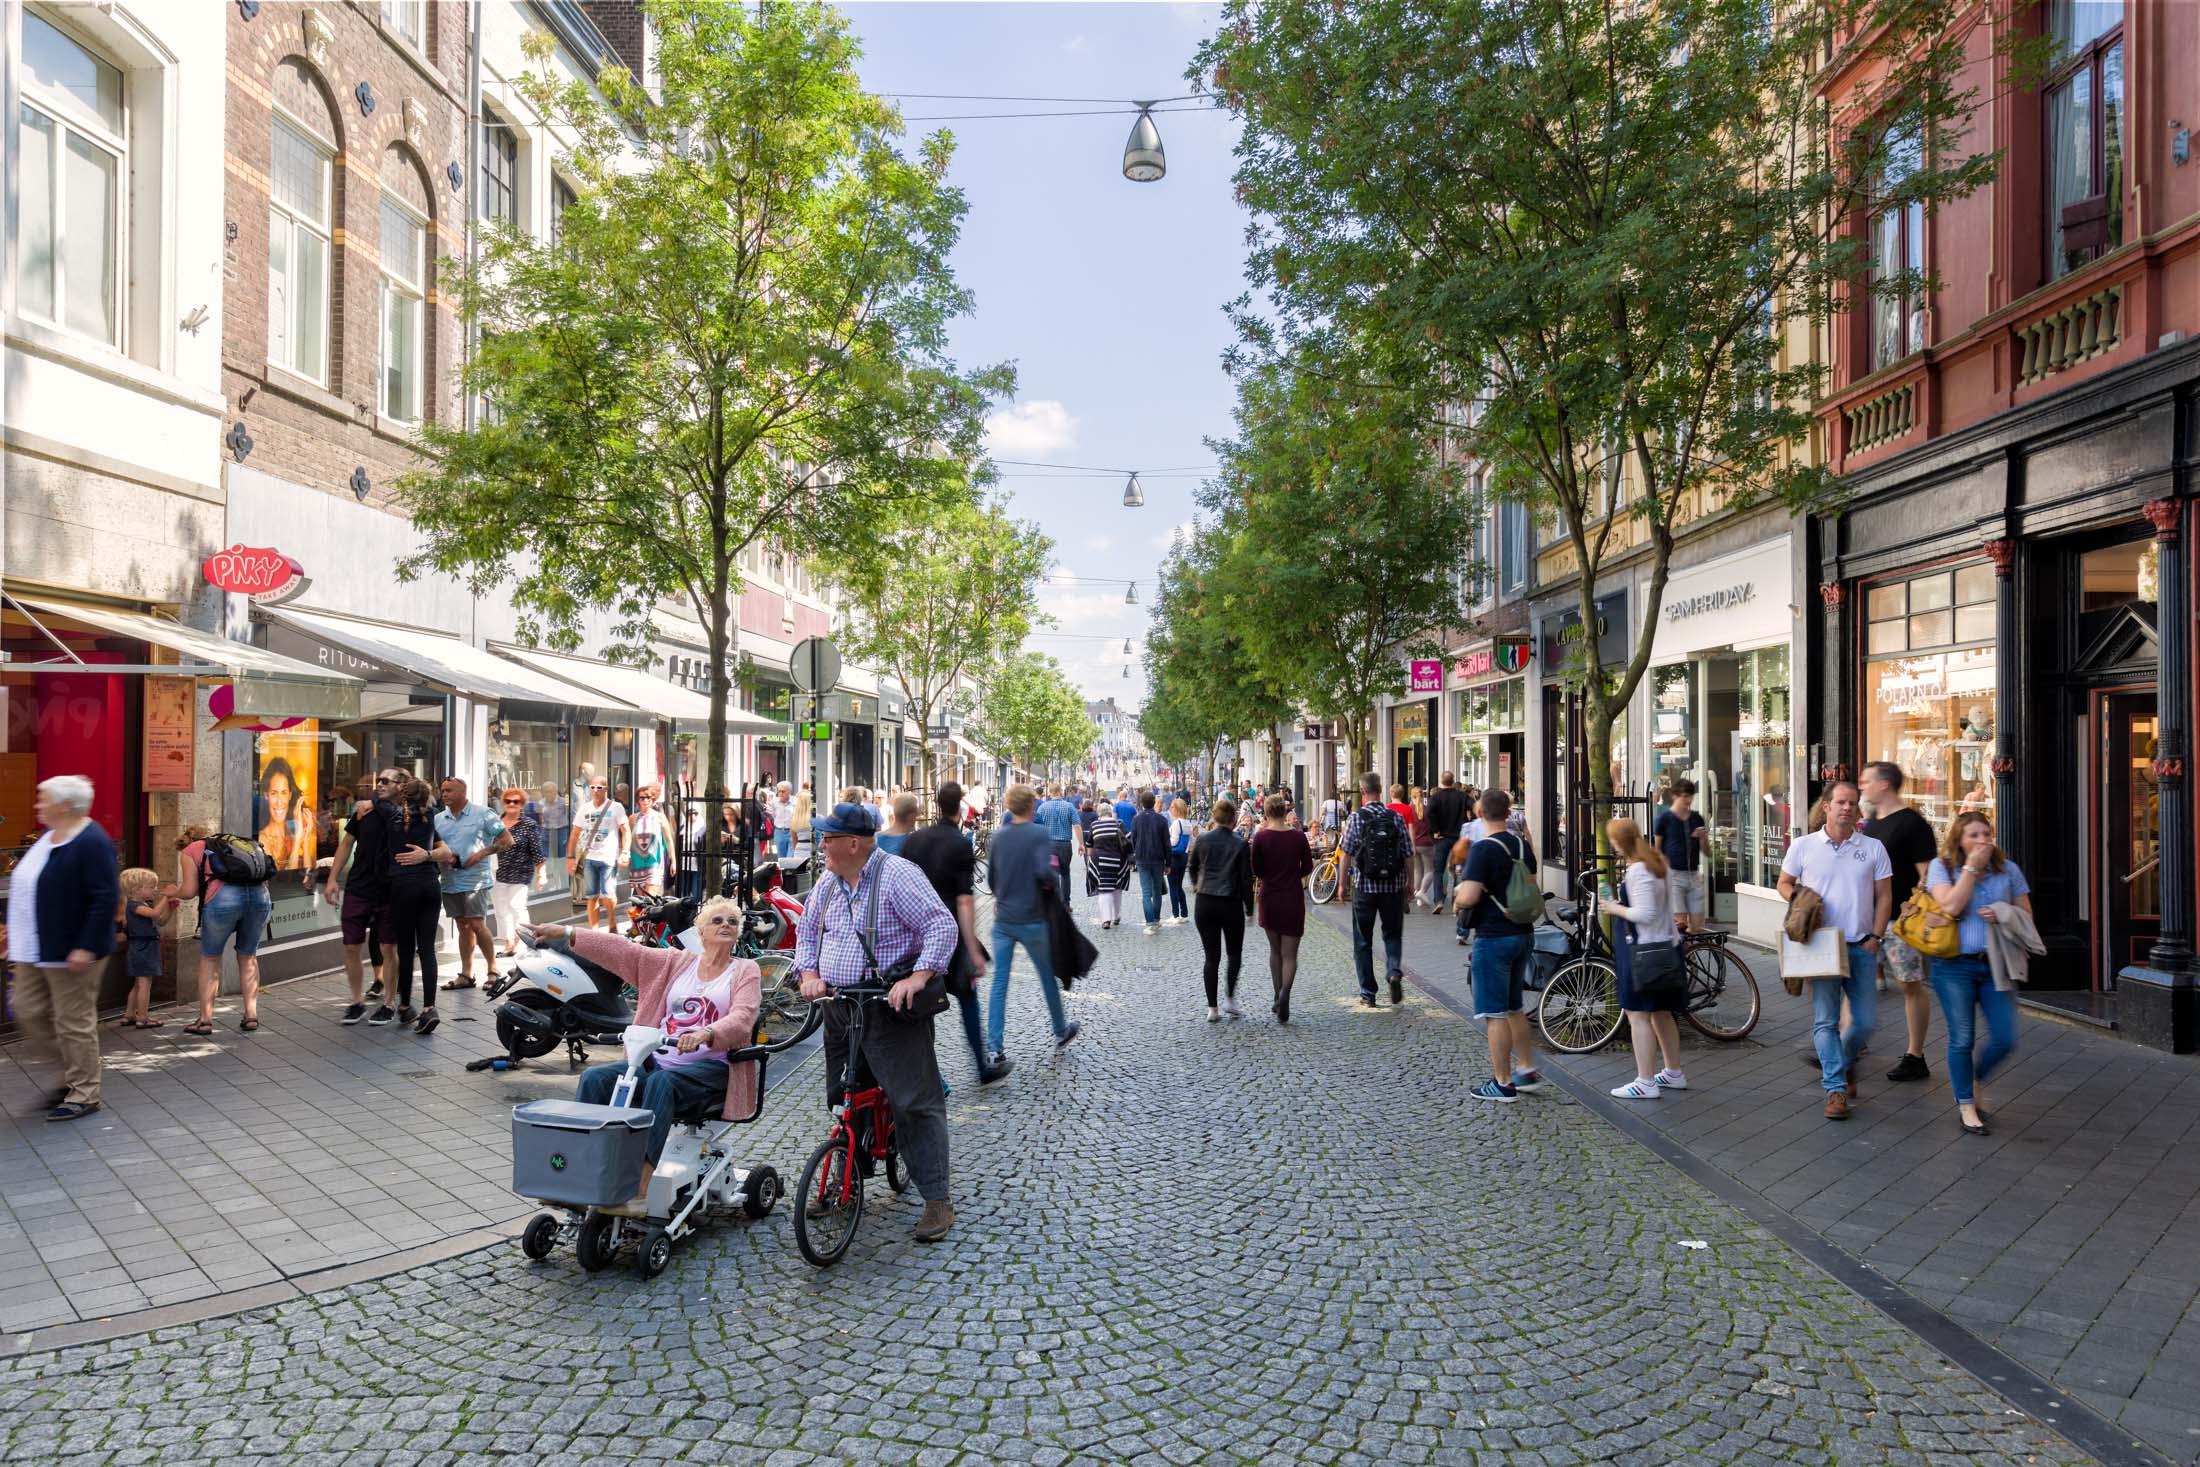 Maastricht-Maastrichter-Brugstraat.jpg